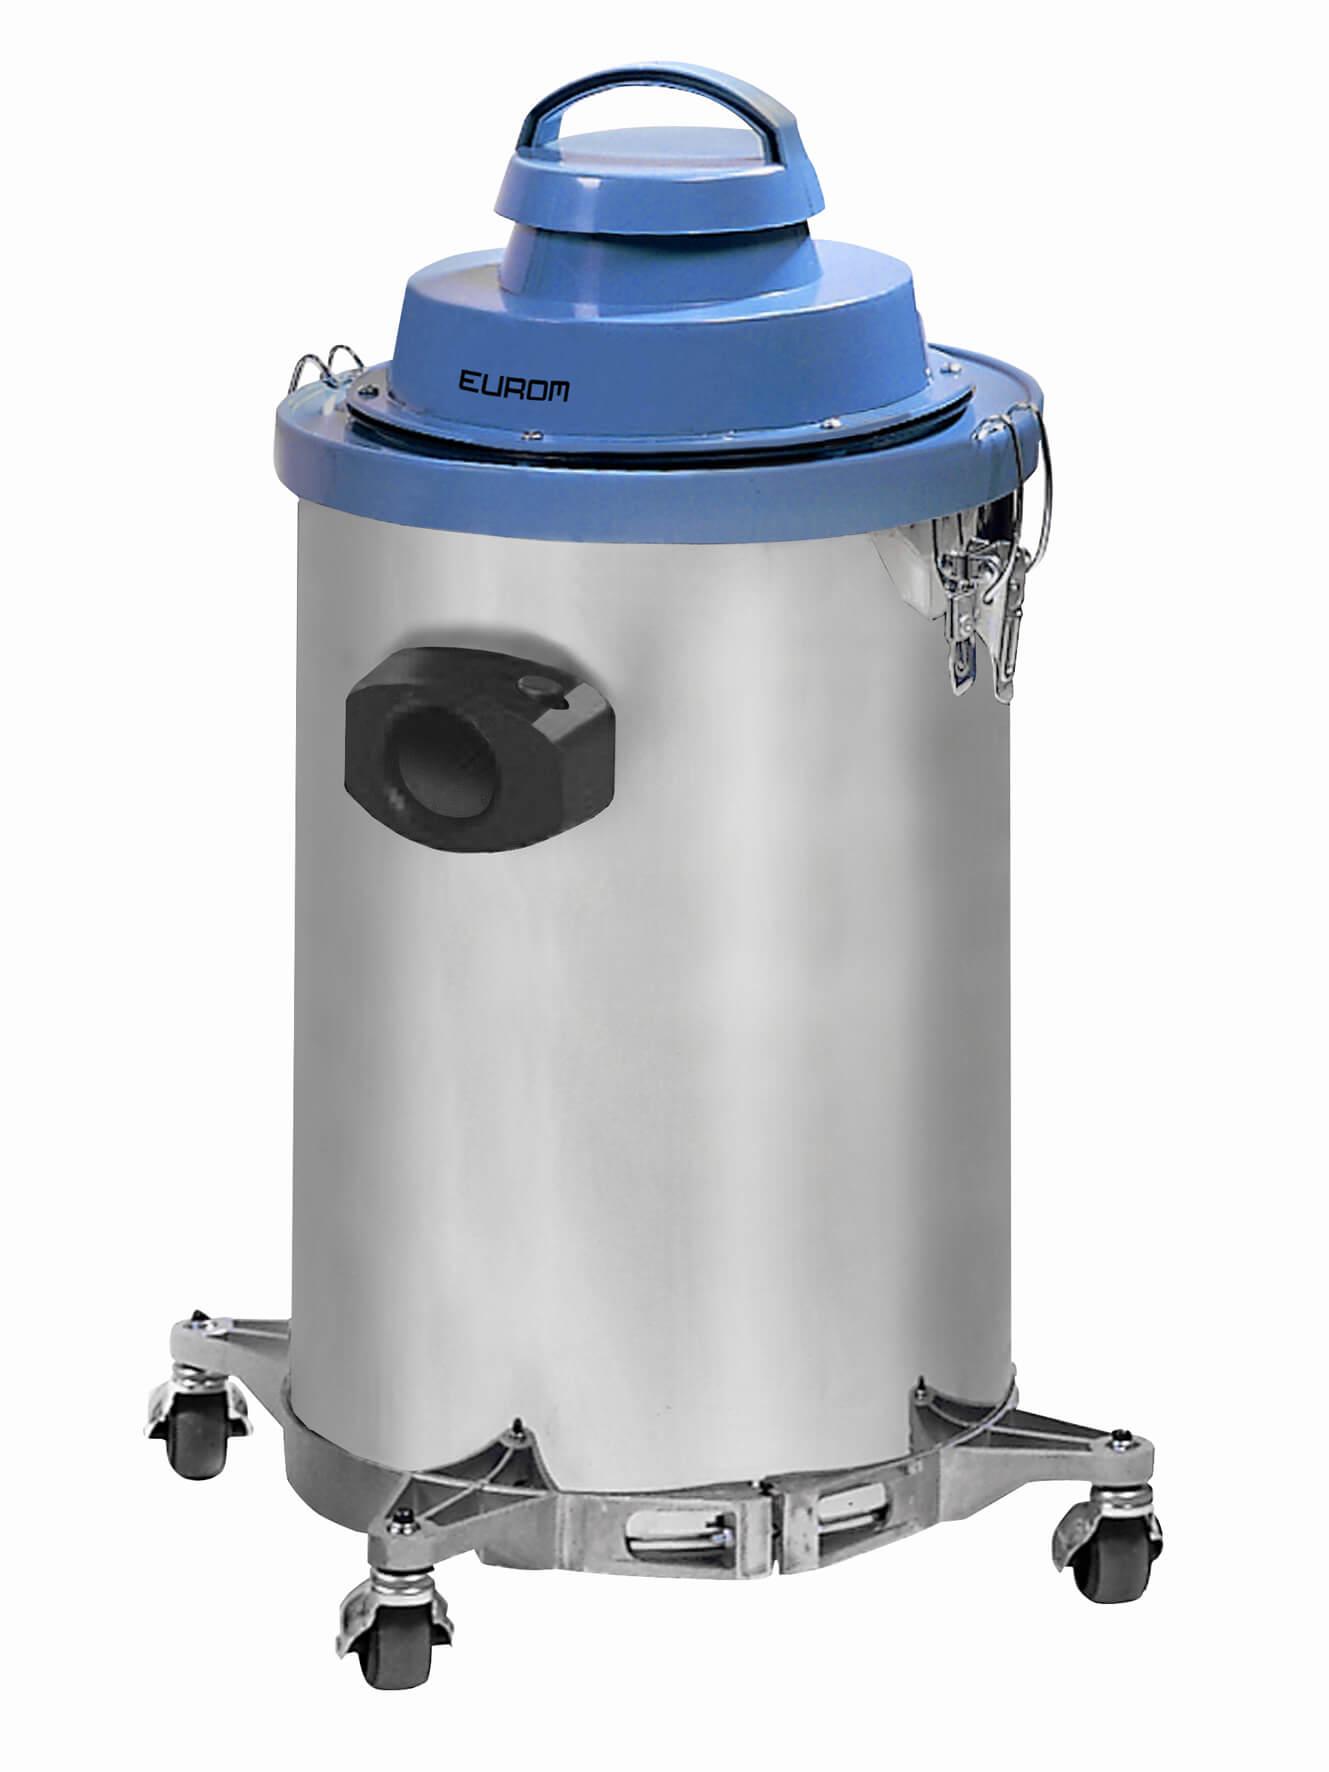 Eurom 1030 RVS Industriële alleszuiger 1000W | Stofzuiger en waterzuiger 30ltr RVS-tank